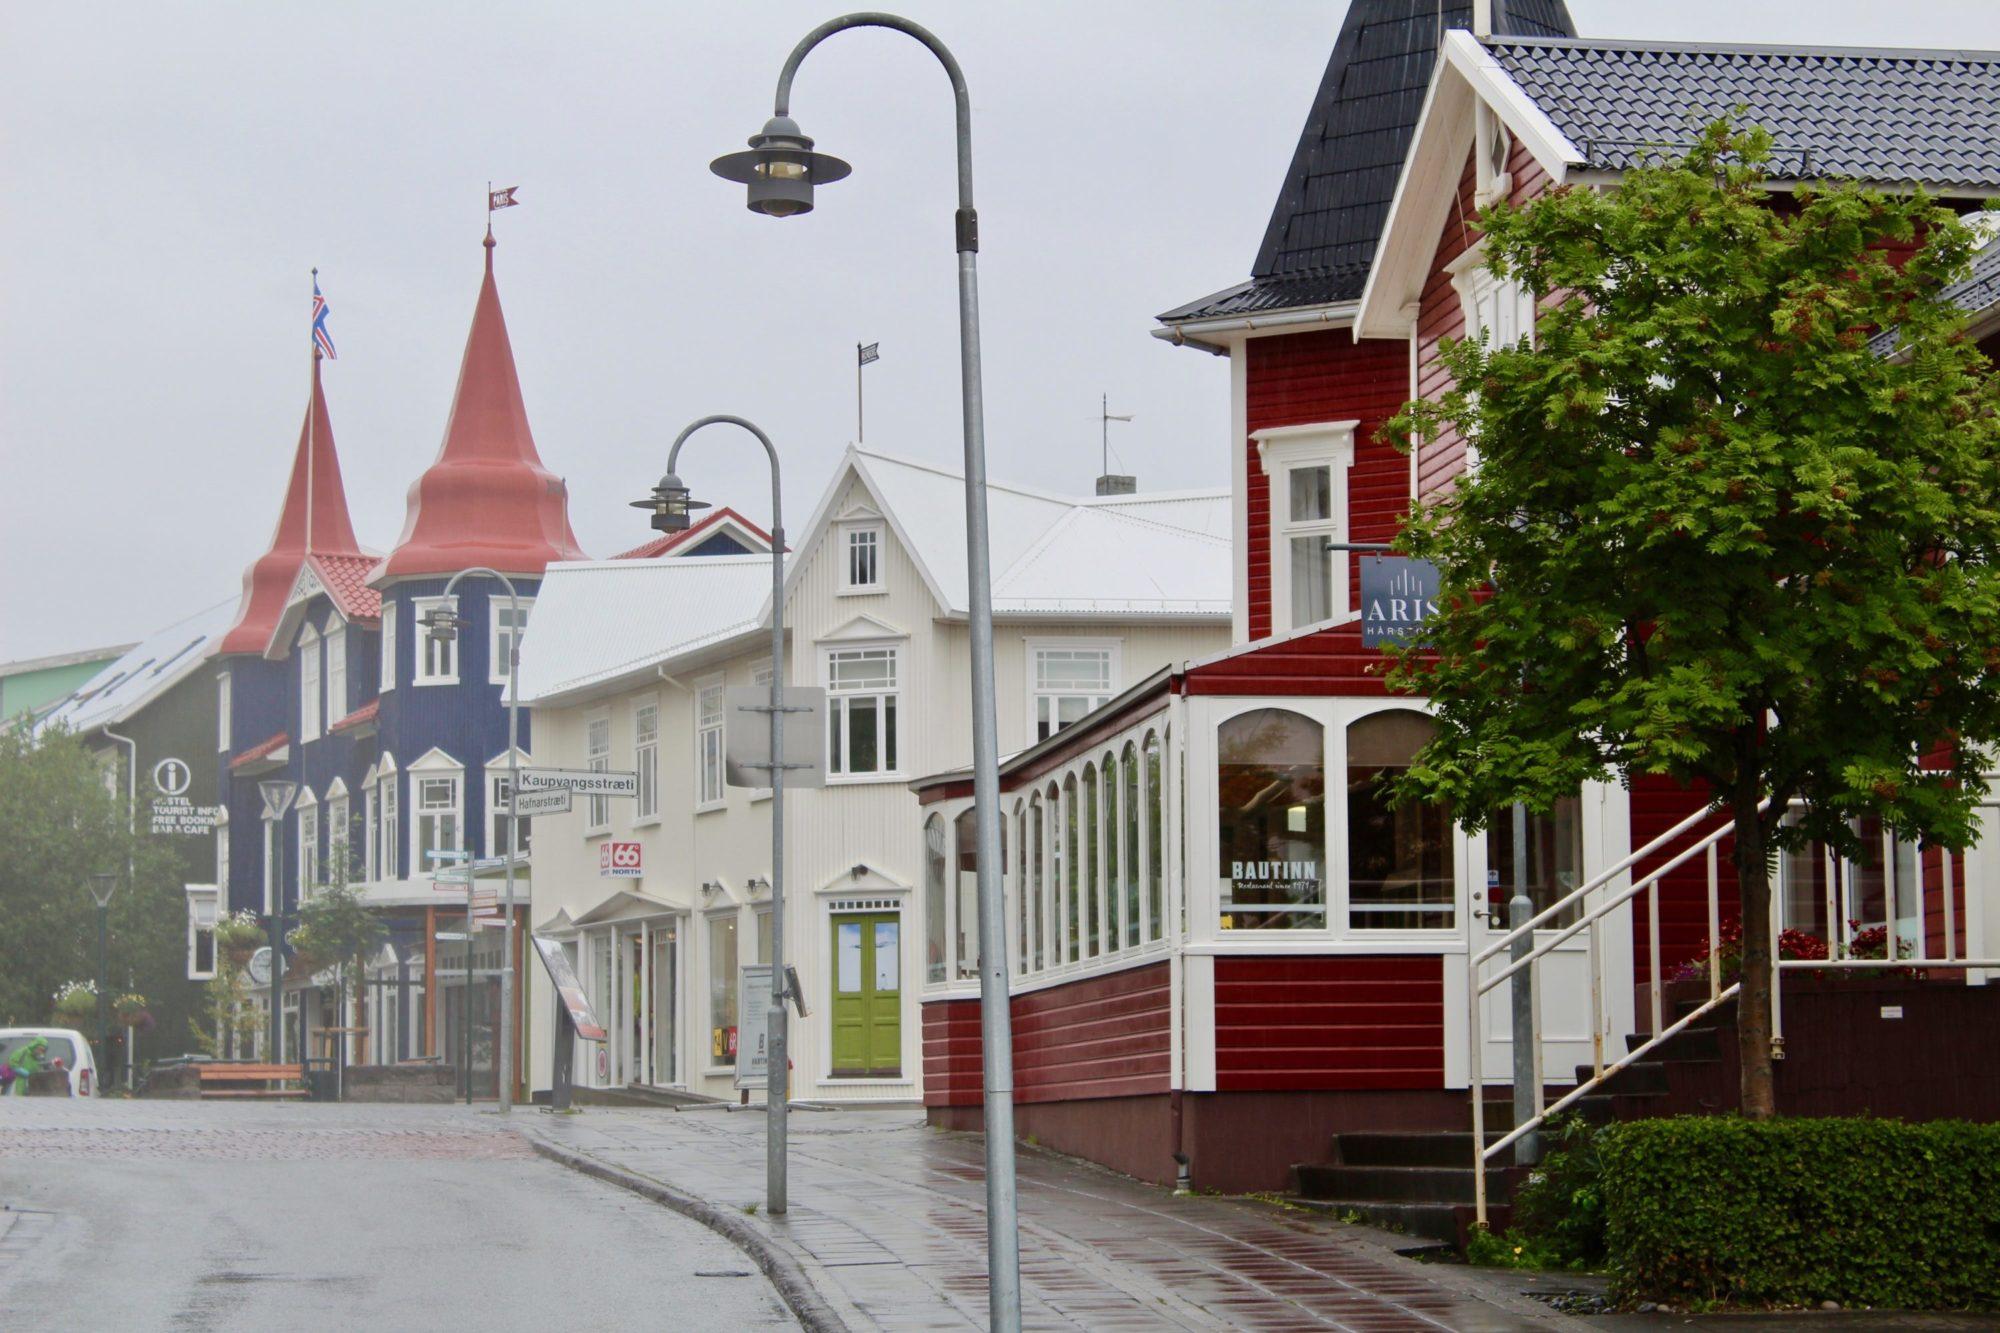 IMG 1134 e1535705846606 ICELAND ROAD TRIP